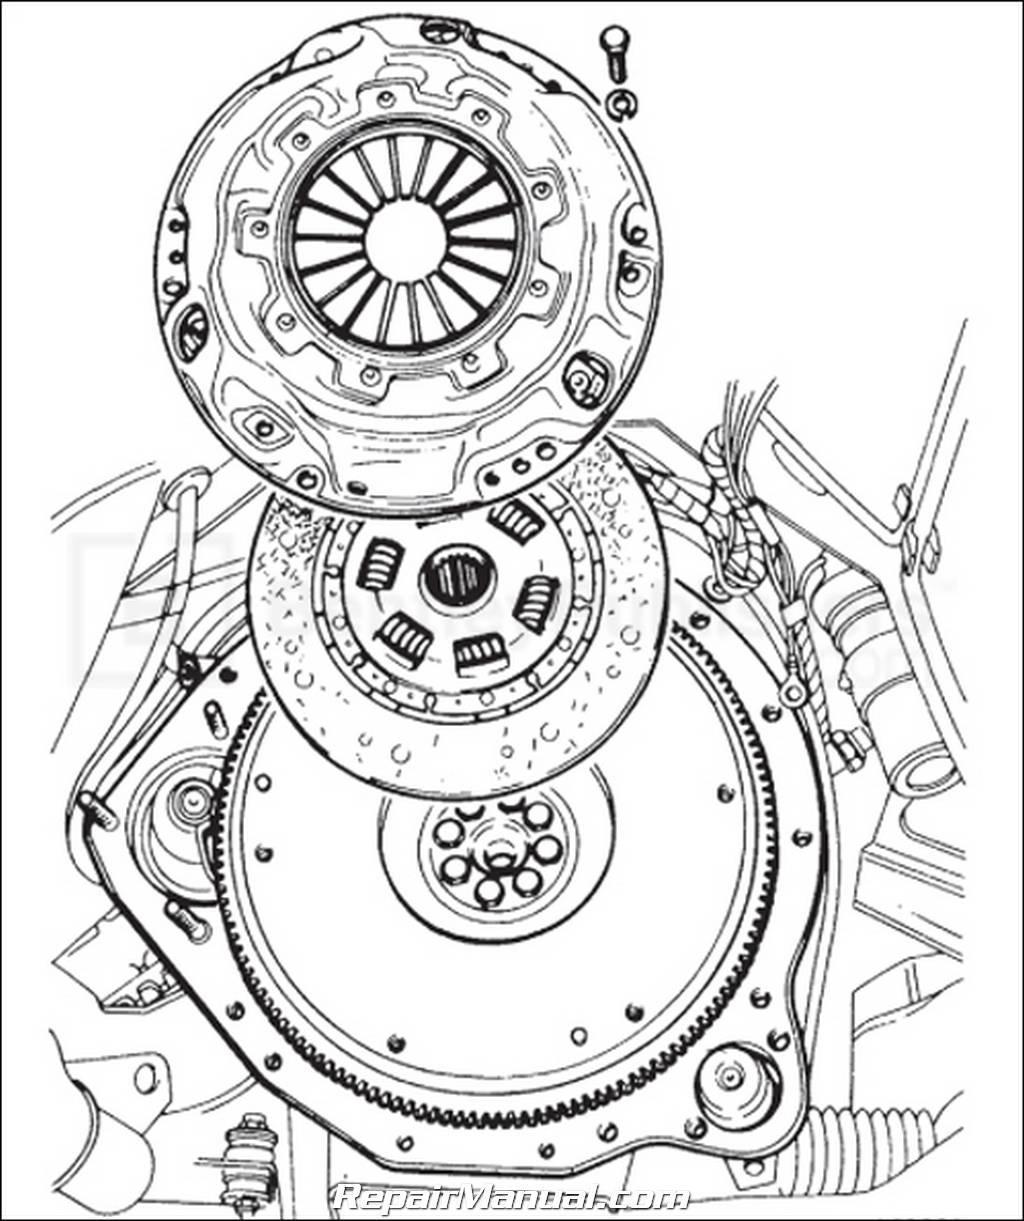 Wiring Diagram Also Triumph Tr3 On, Wiring, Get Free Image